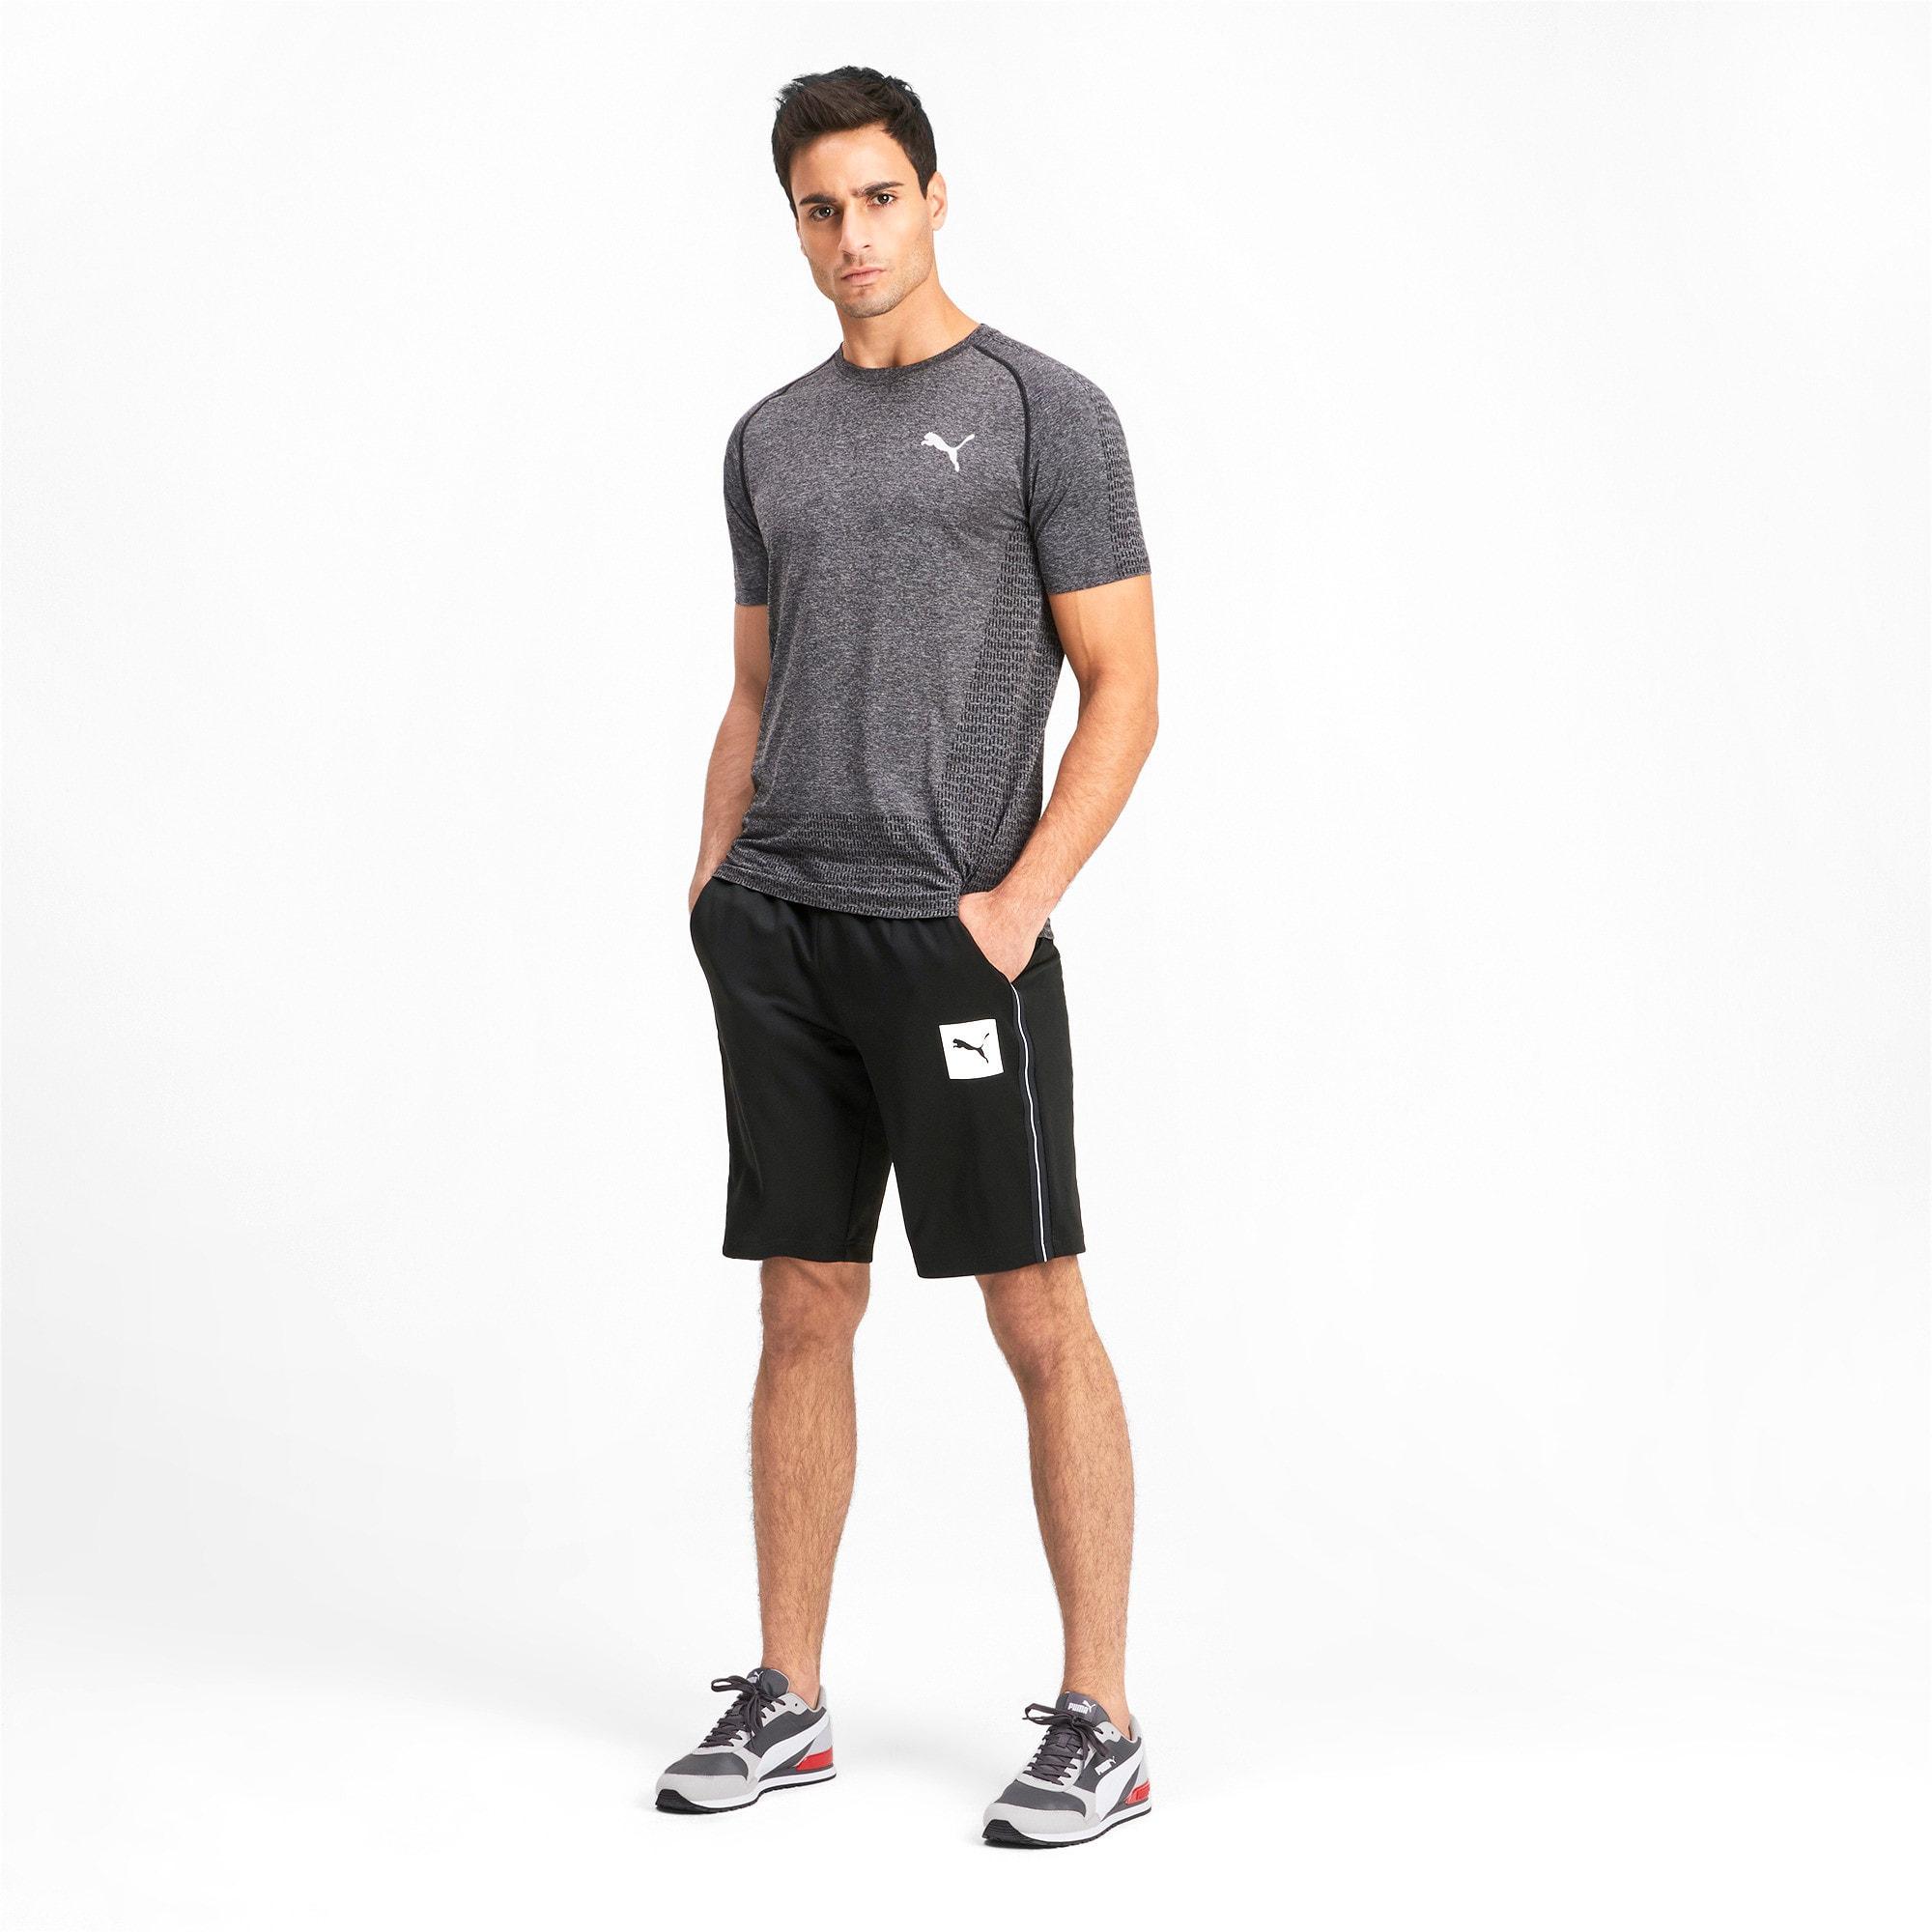 Thumbnail 3 of Tec Sports Interlock Men's Shorts, Puma Black, medium-IND